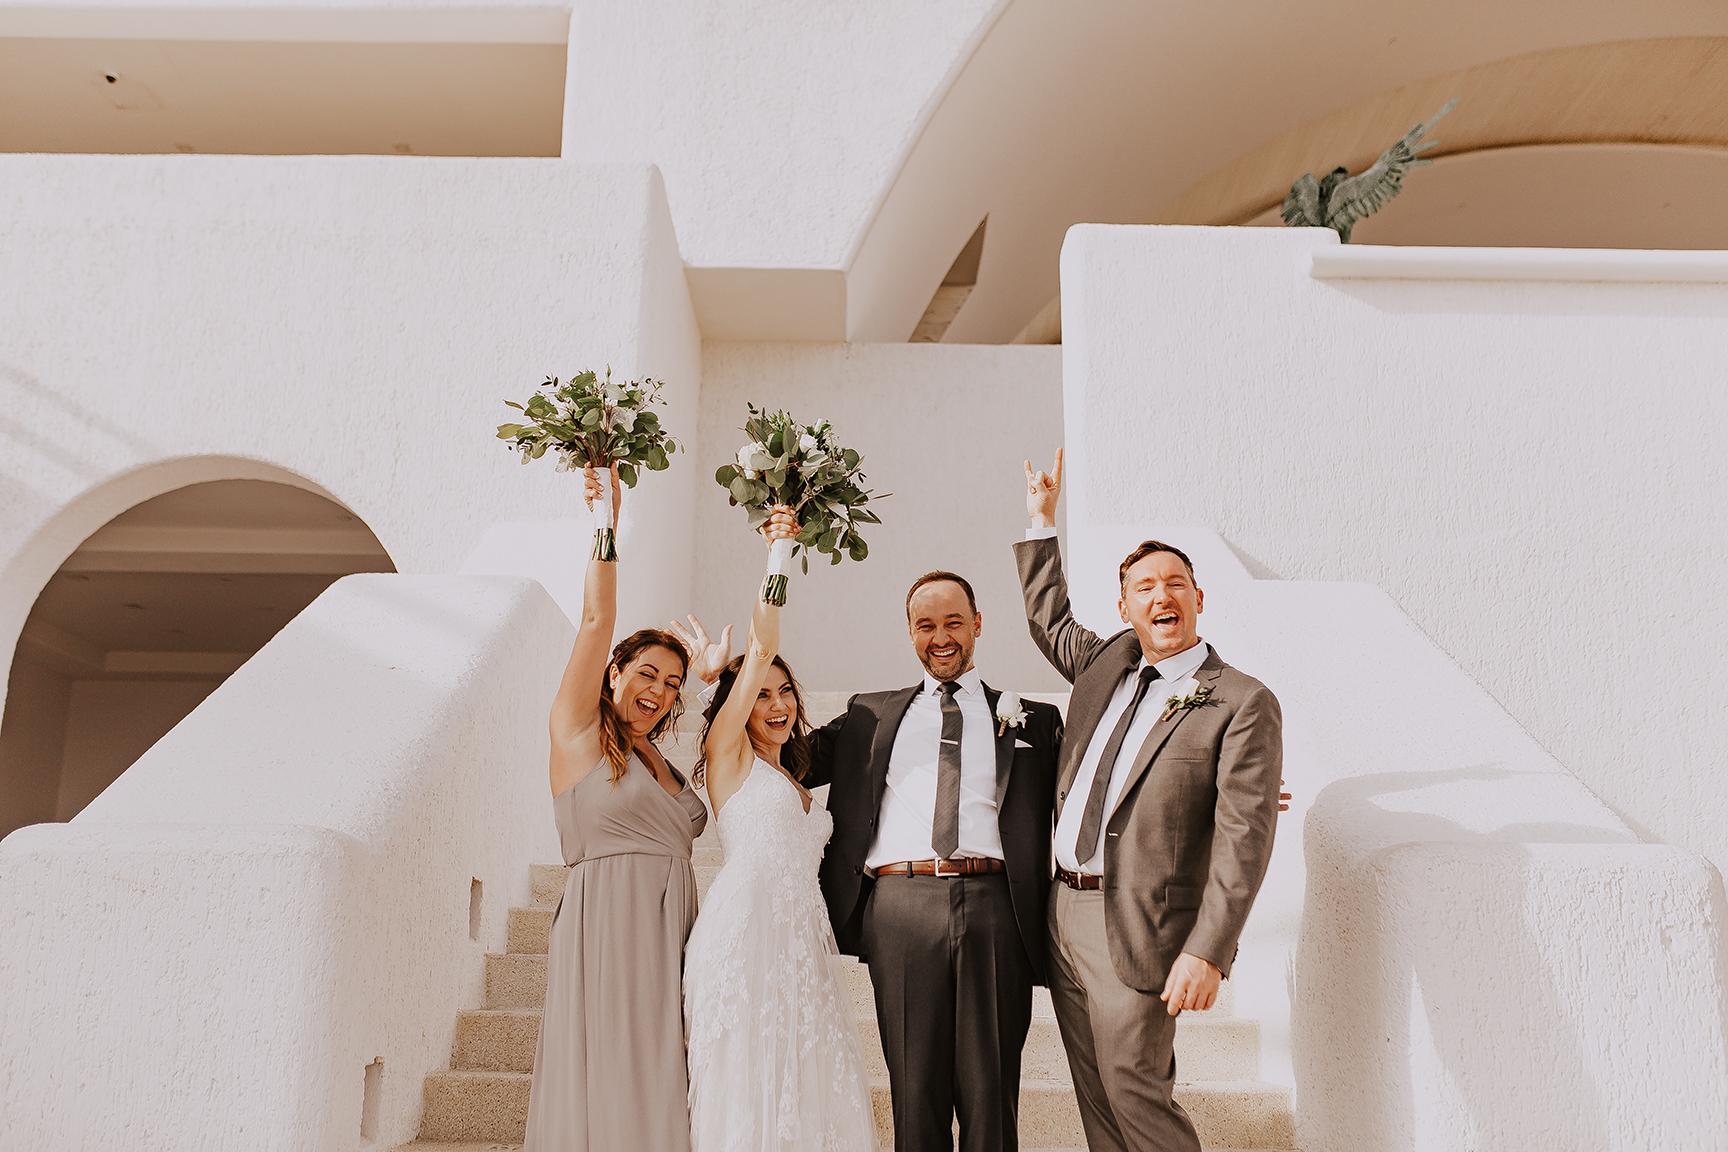 Lindsei+James_cabo_wedding_402.jpg